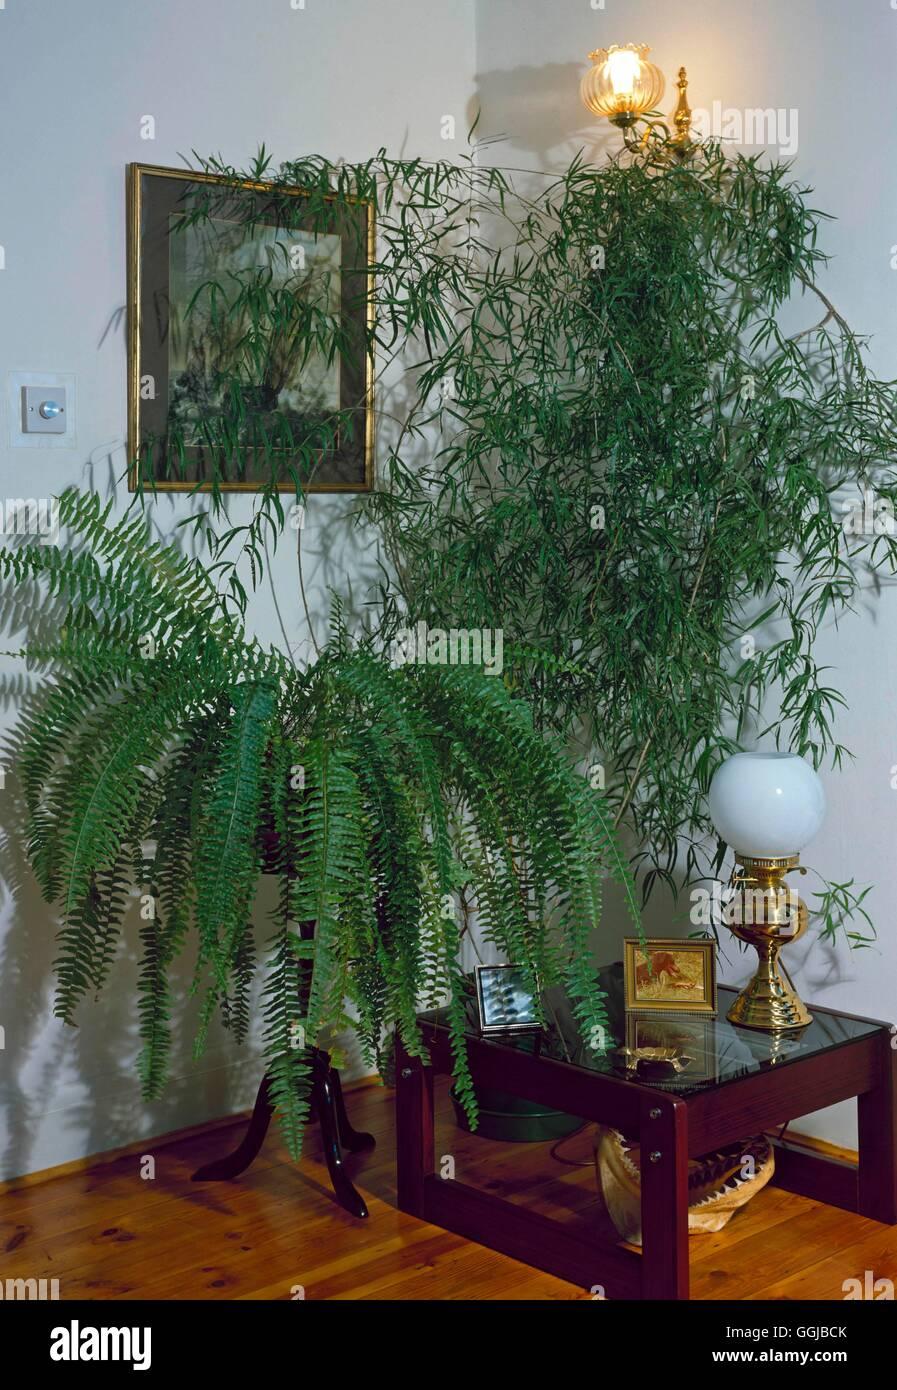 Asparagus Falcatus Stock Photos & Asparagus Falcatus Stock Images ...